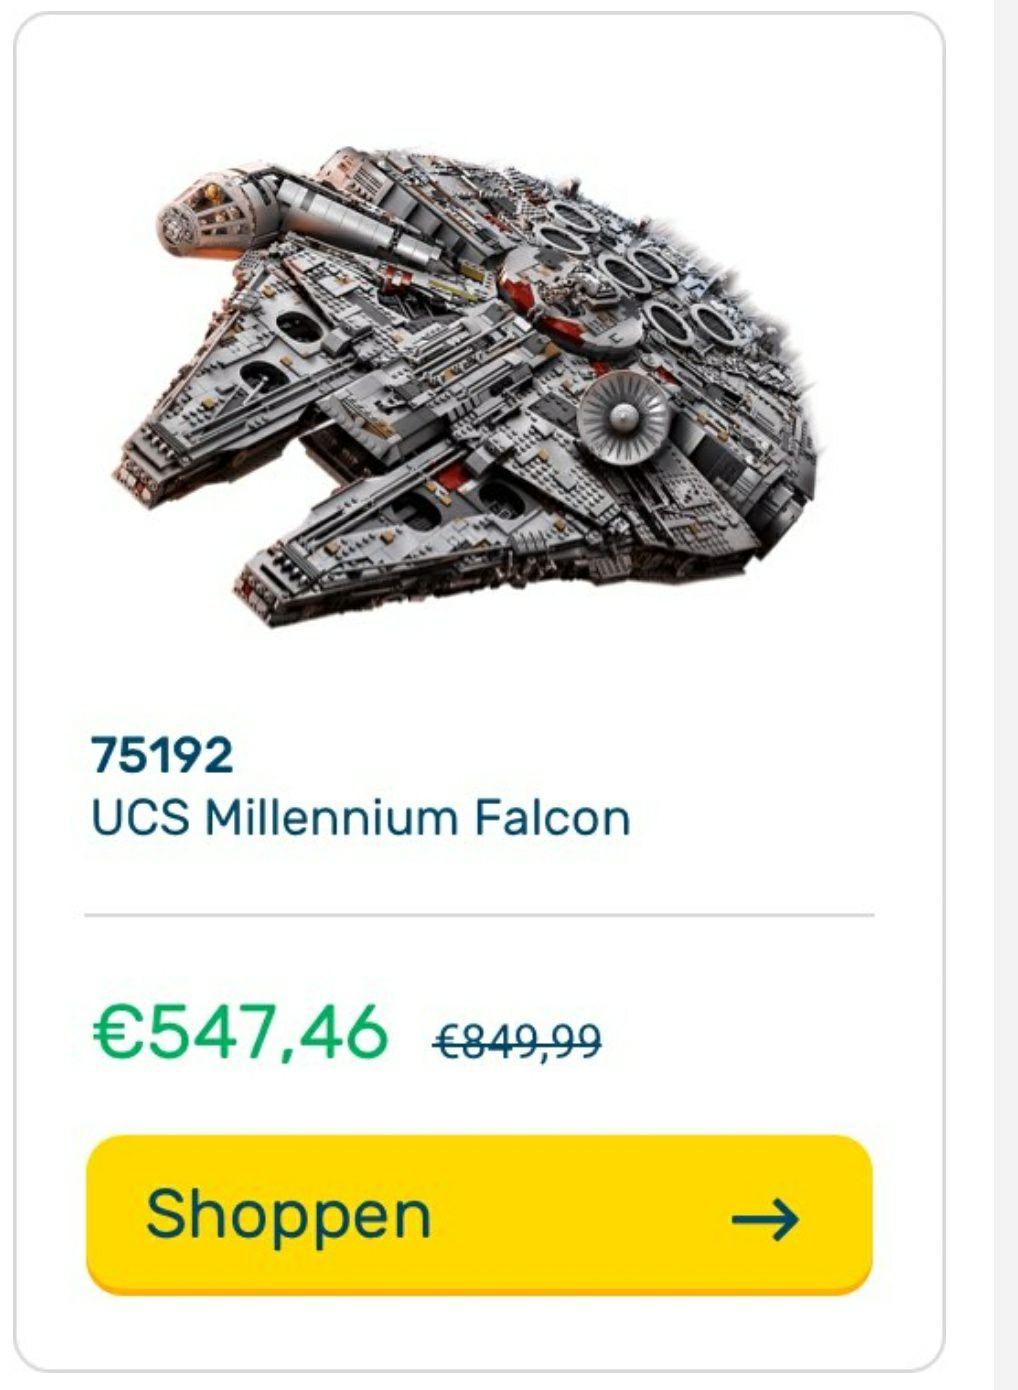 Lego 25% korting op oa 75192 UCS Millennium Falcon @A-Tembo